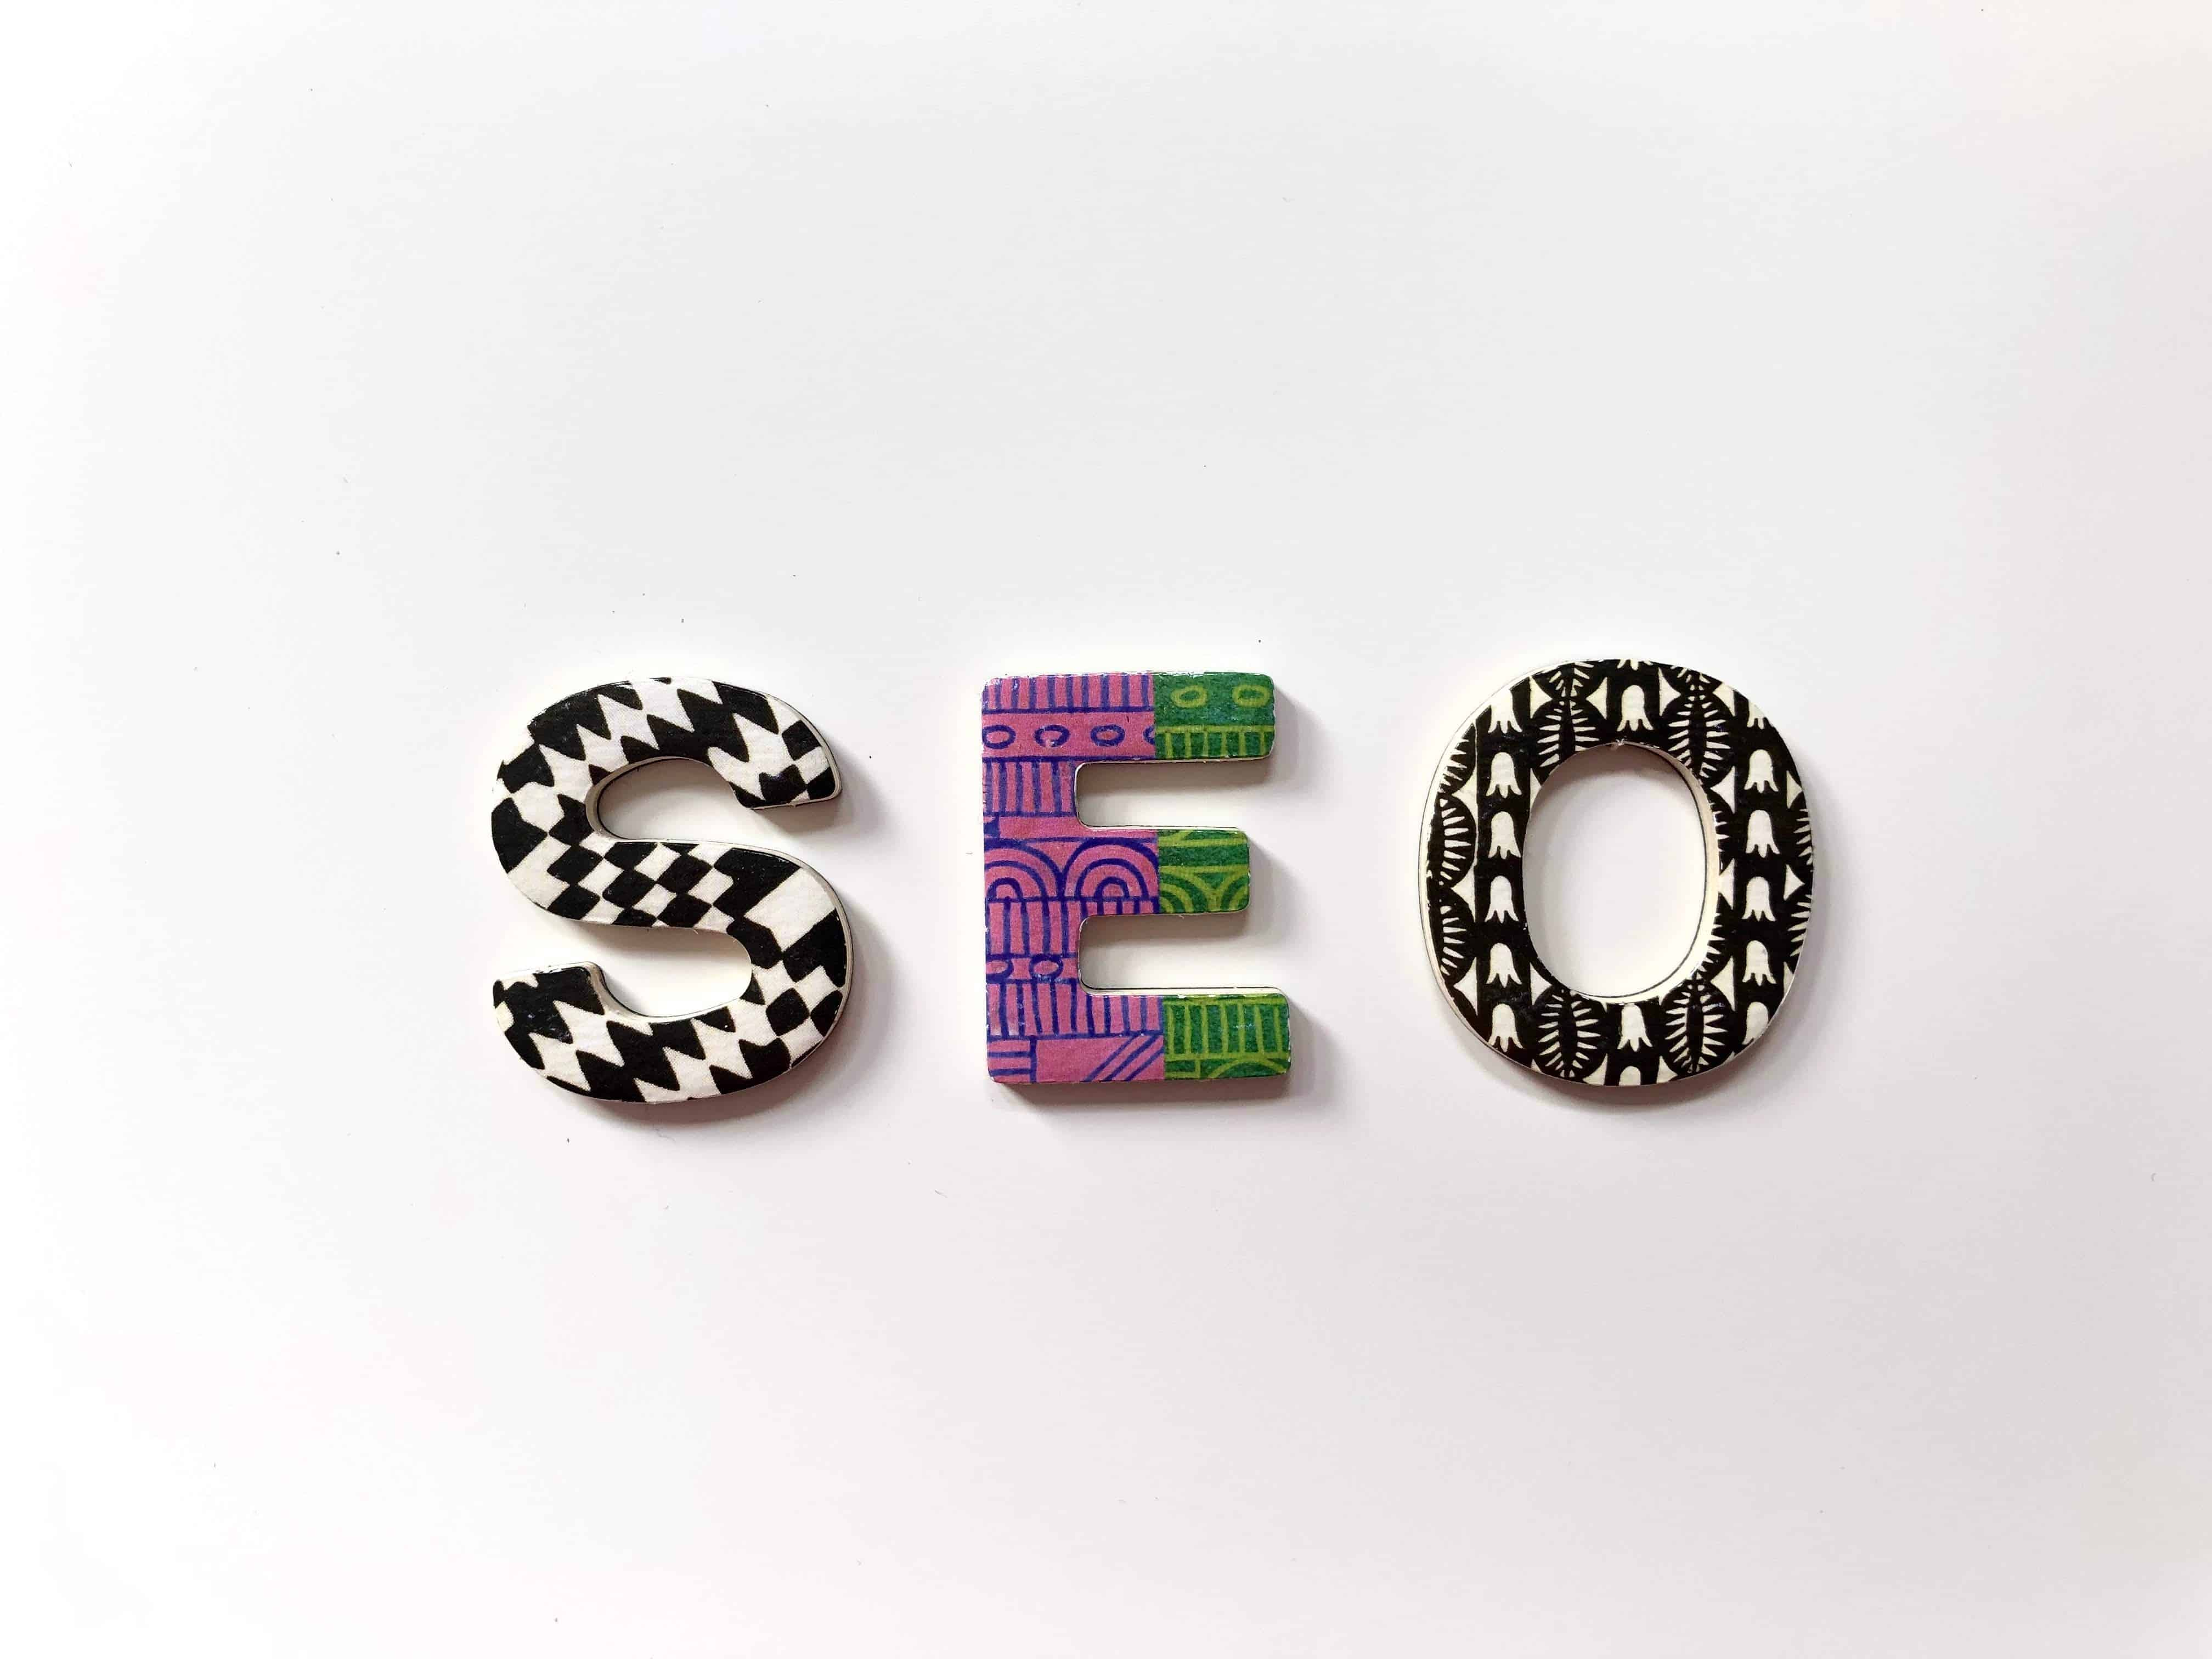 SEO for beginners digital marketing skills 2020